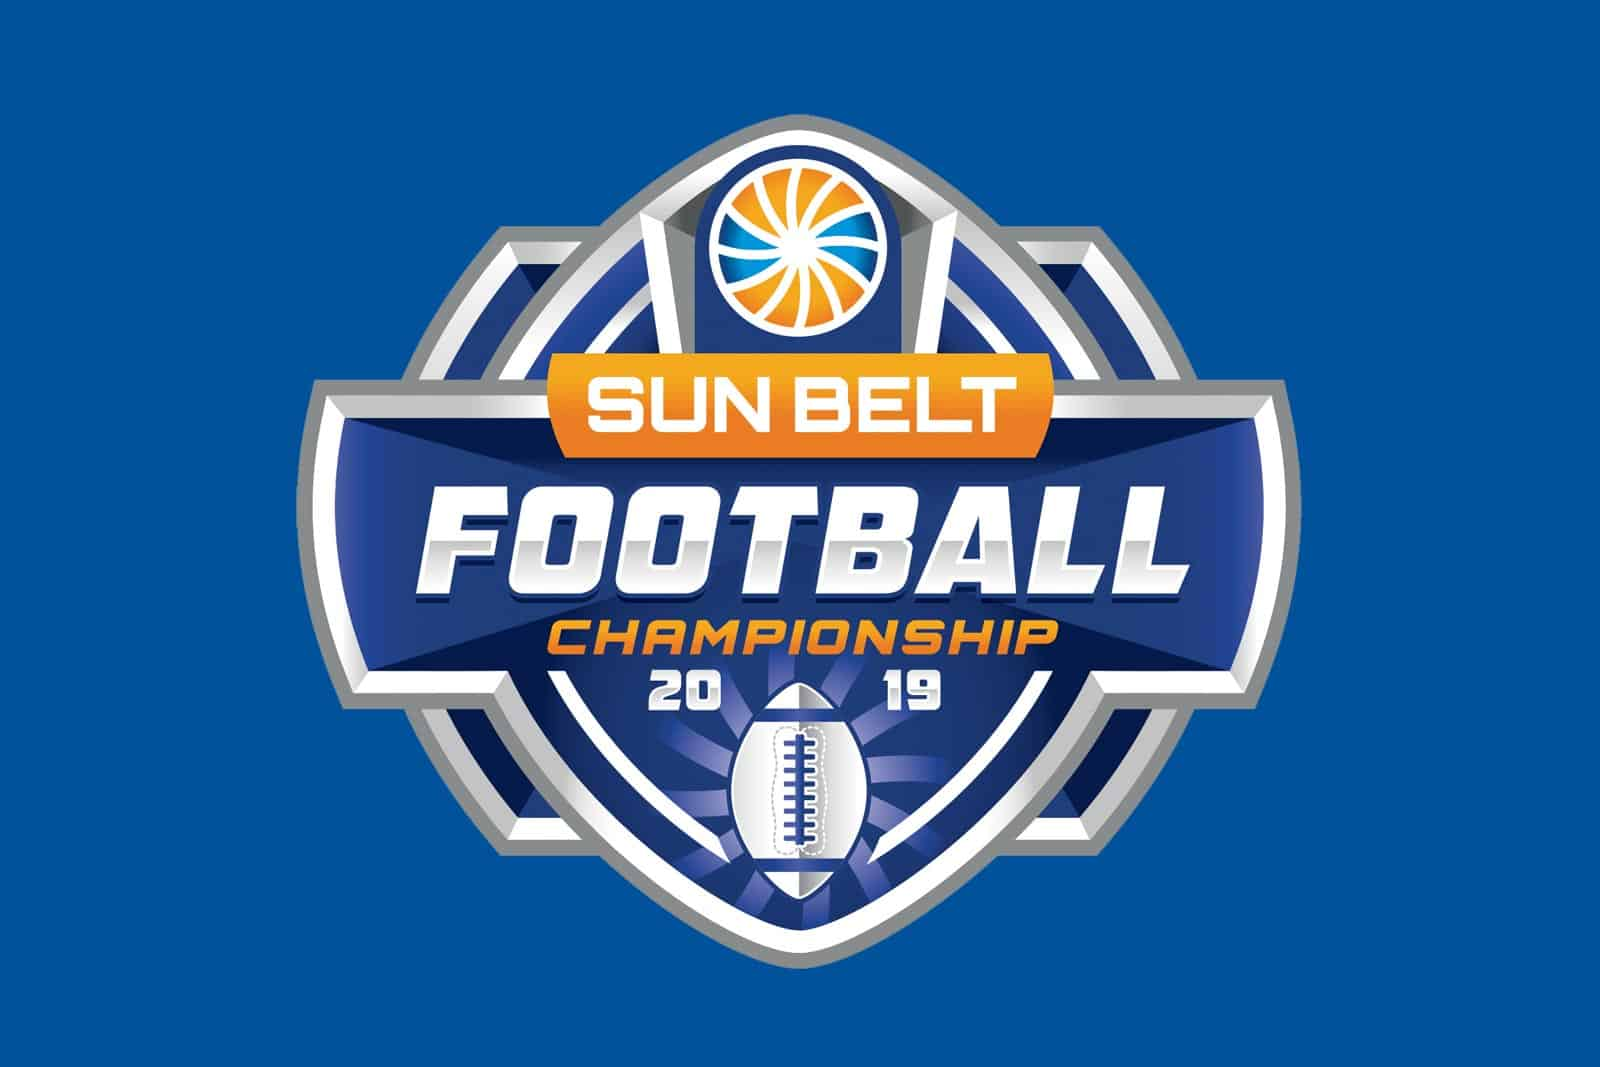 2019 Sun Belt Championship Game